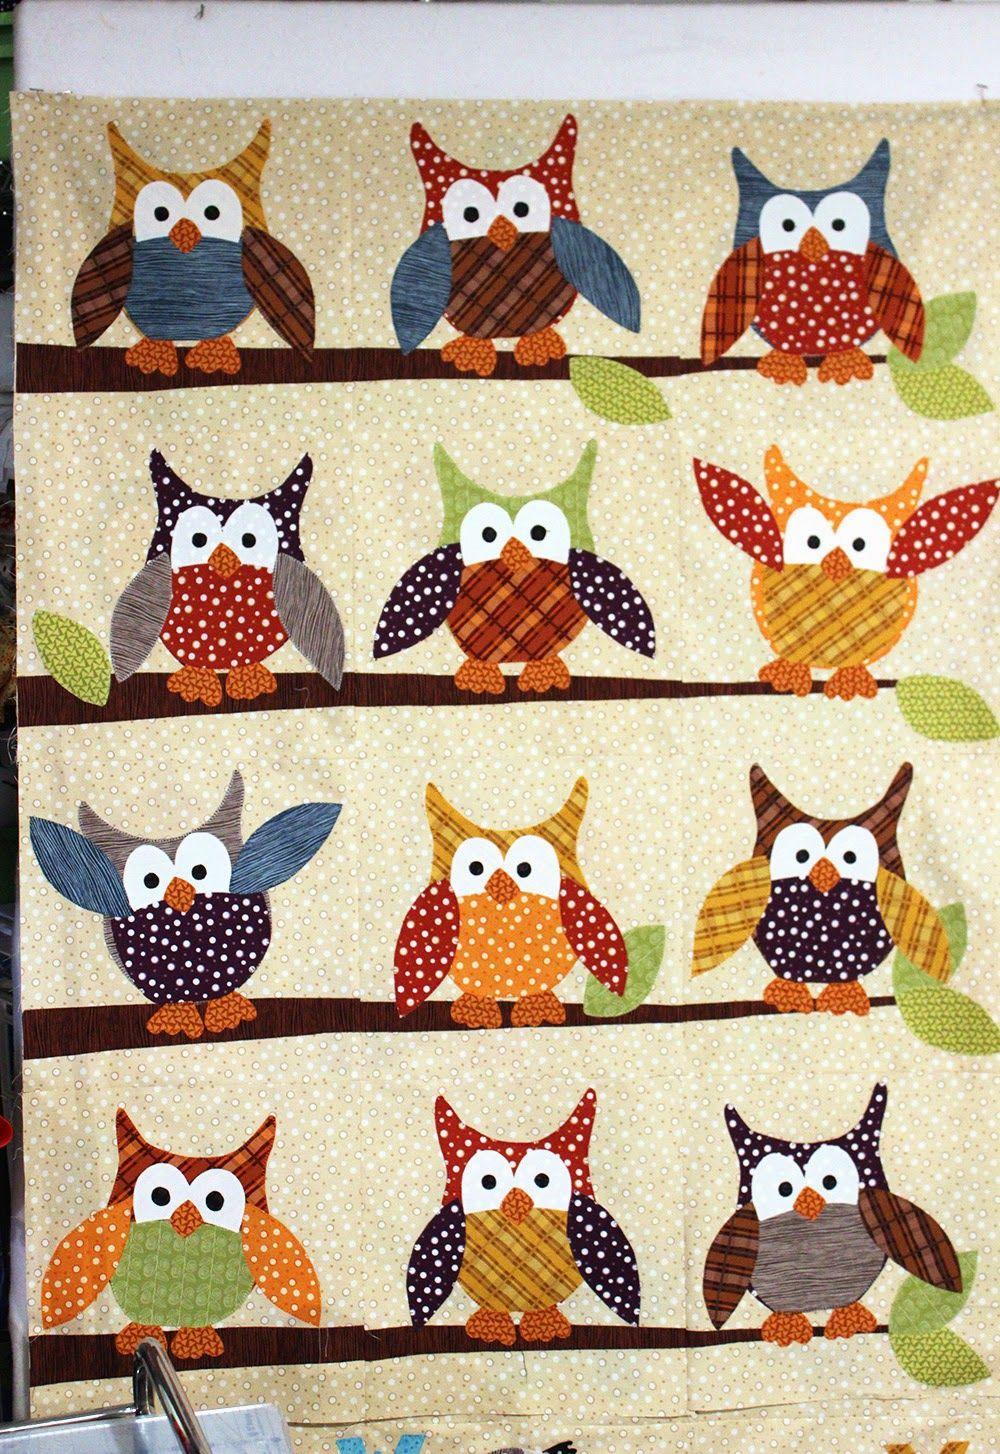 free owl quilt block pattern - Google Search | Sewing | Pinterest ... : owl pattern quilt - Adamdwight.com